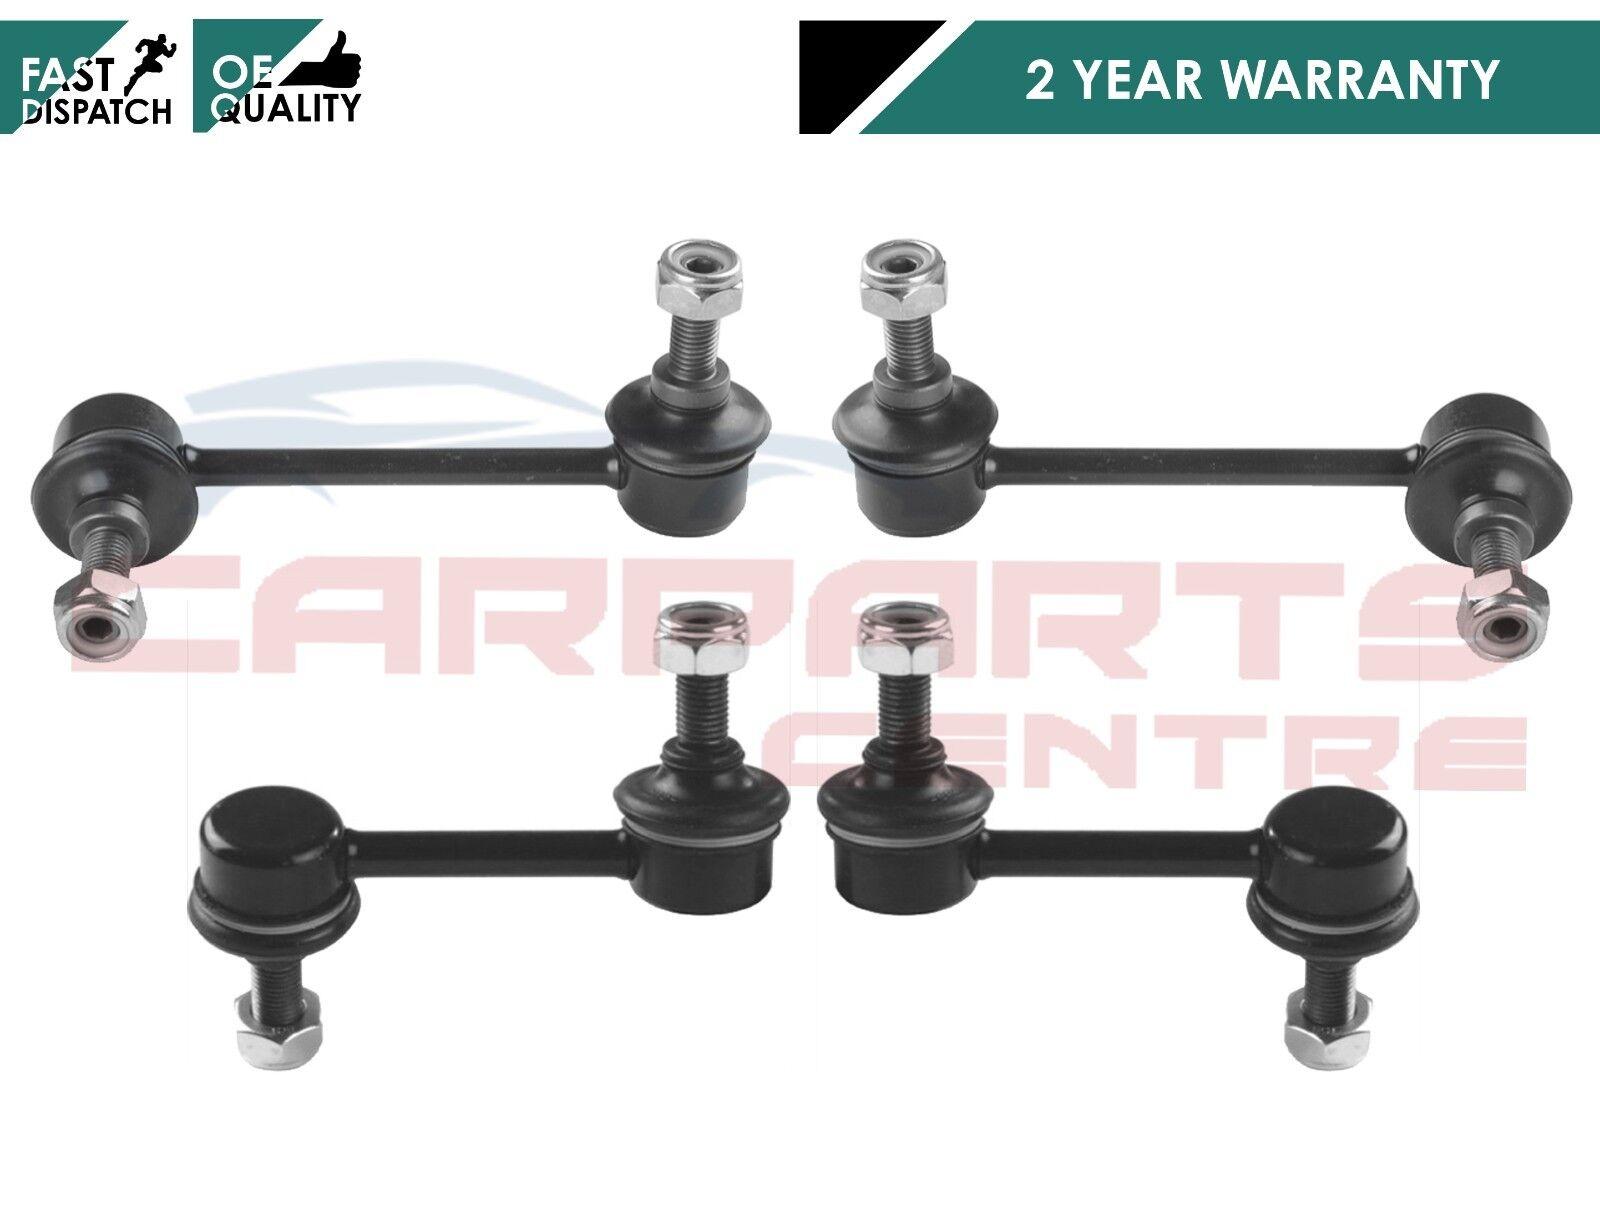 Rear Stabiliser Anti Roll Bar Drop Links Fit for Mk3 2.0 2.2 TDCi